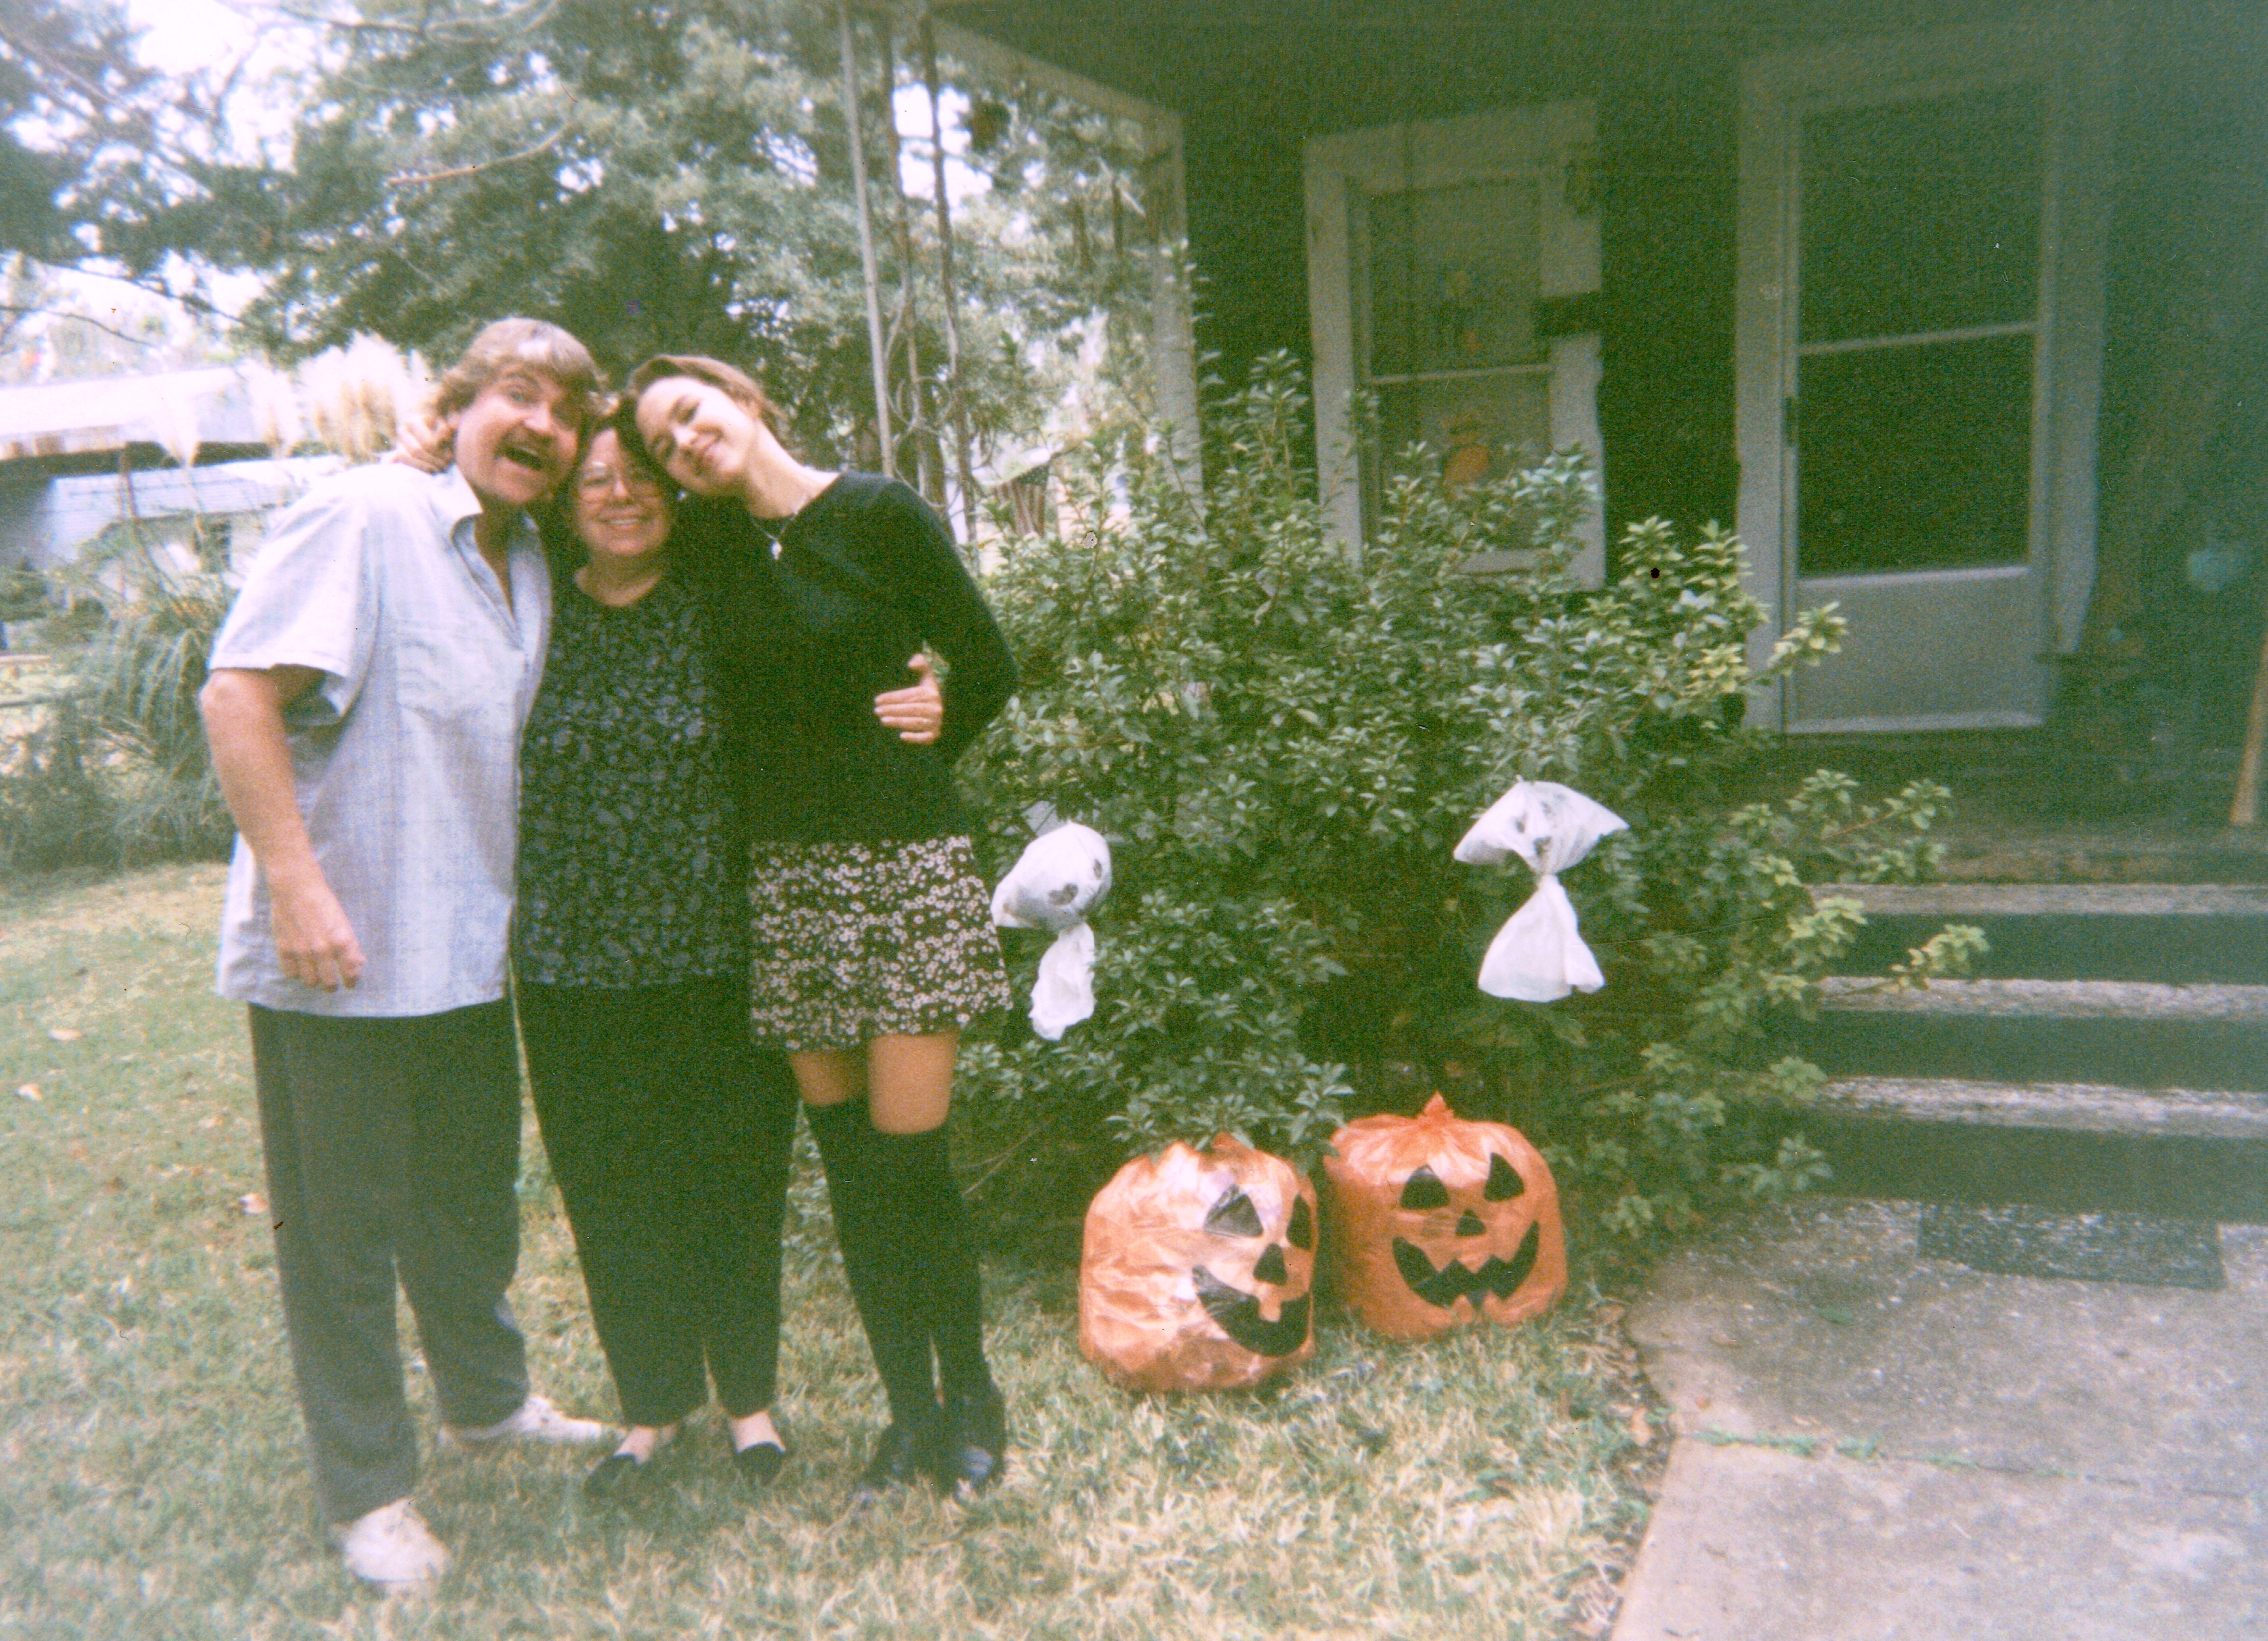 Mama Me and Johnny Halloween